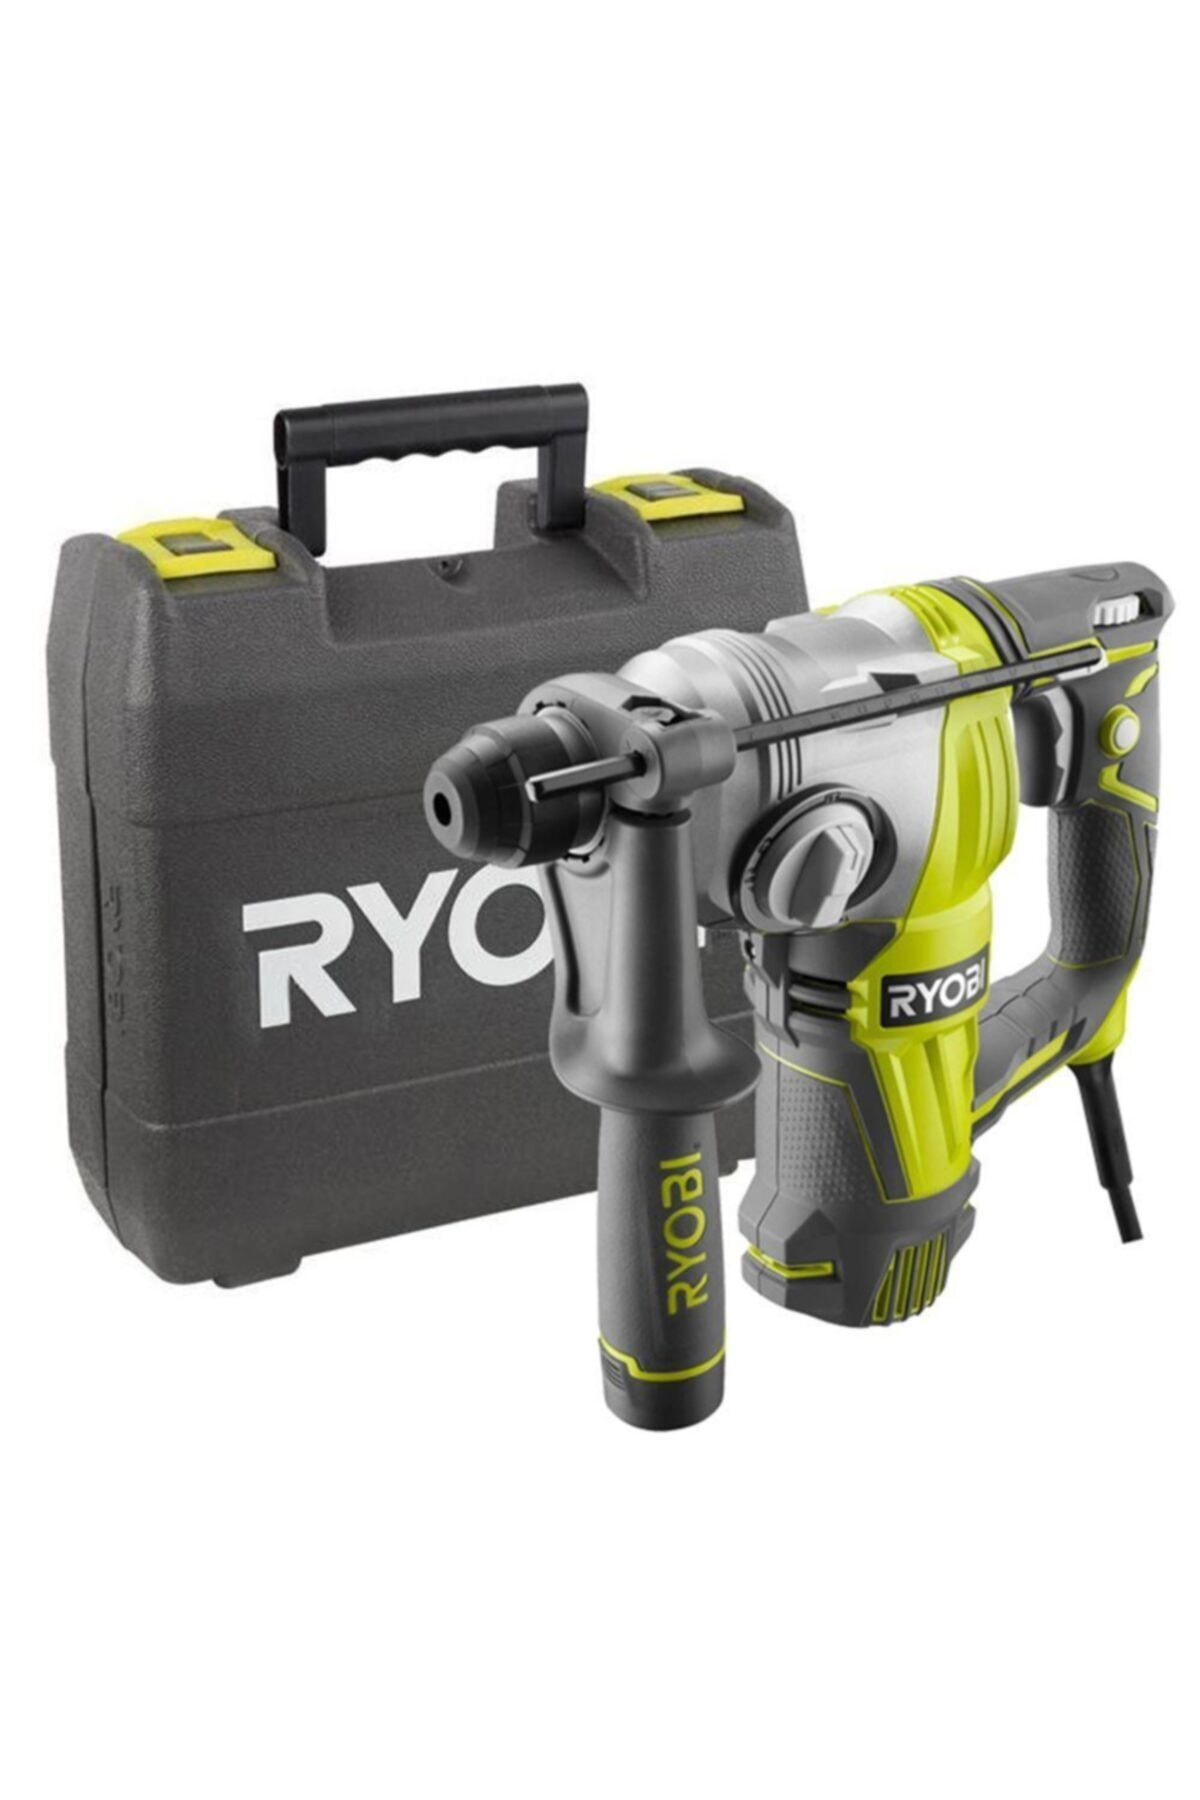 Ryobi 800 watt 2.9j Sds-plus Kırıcı Delici Rsds800k 2